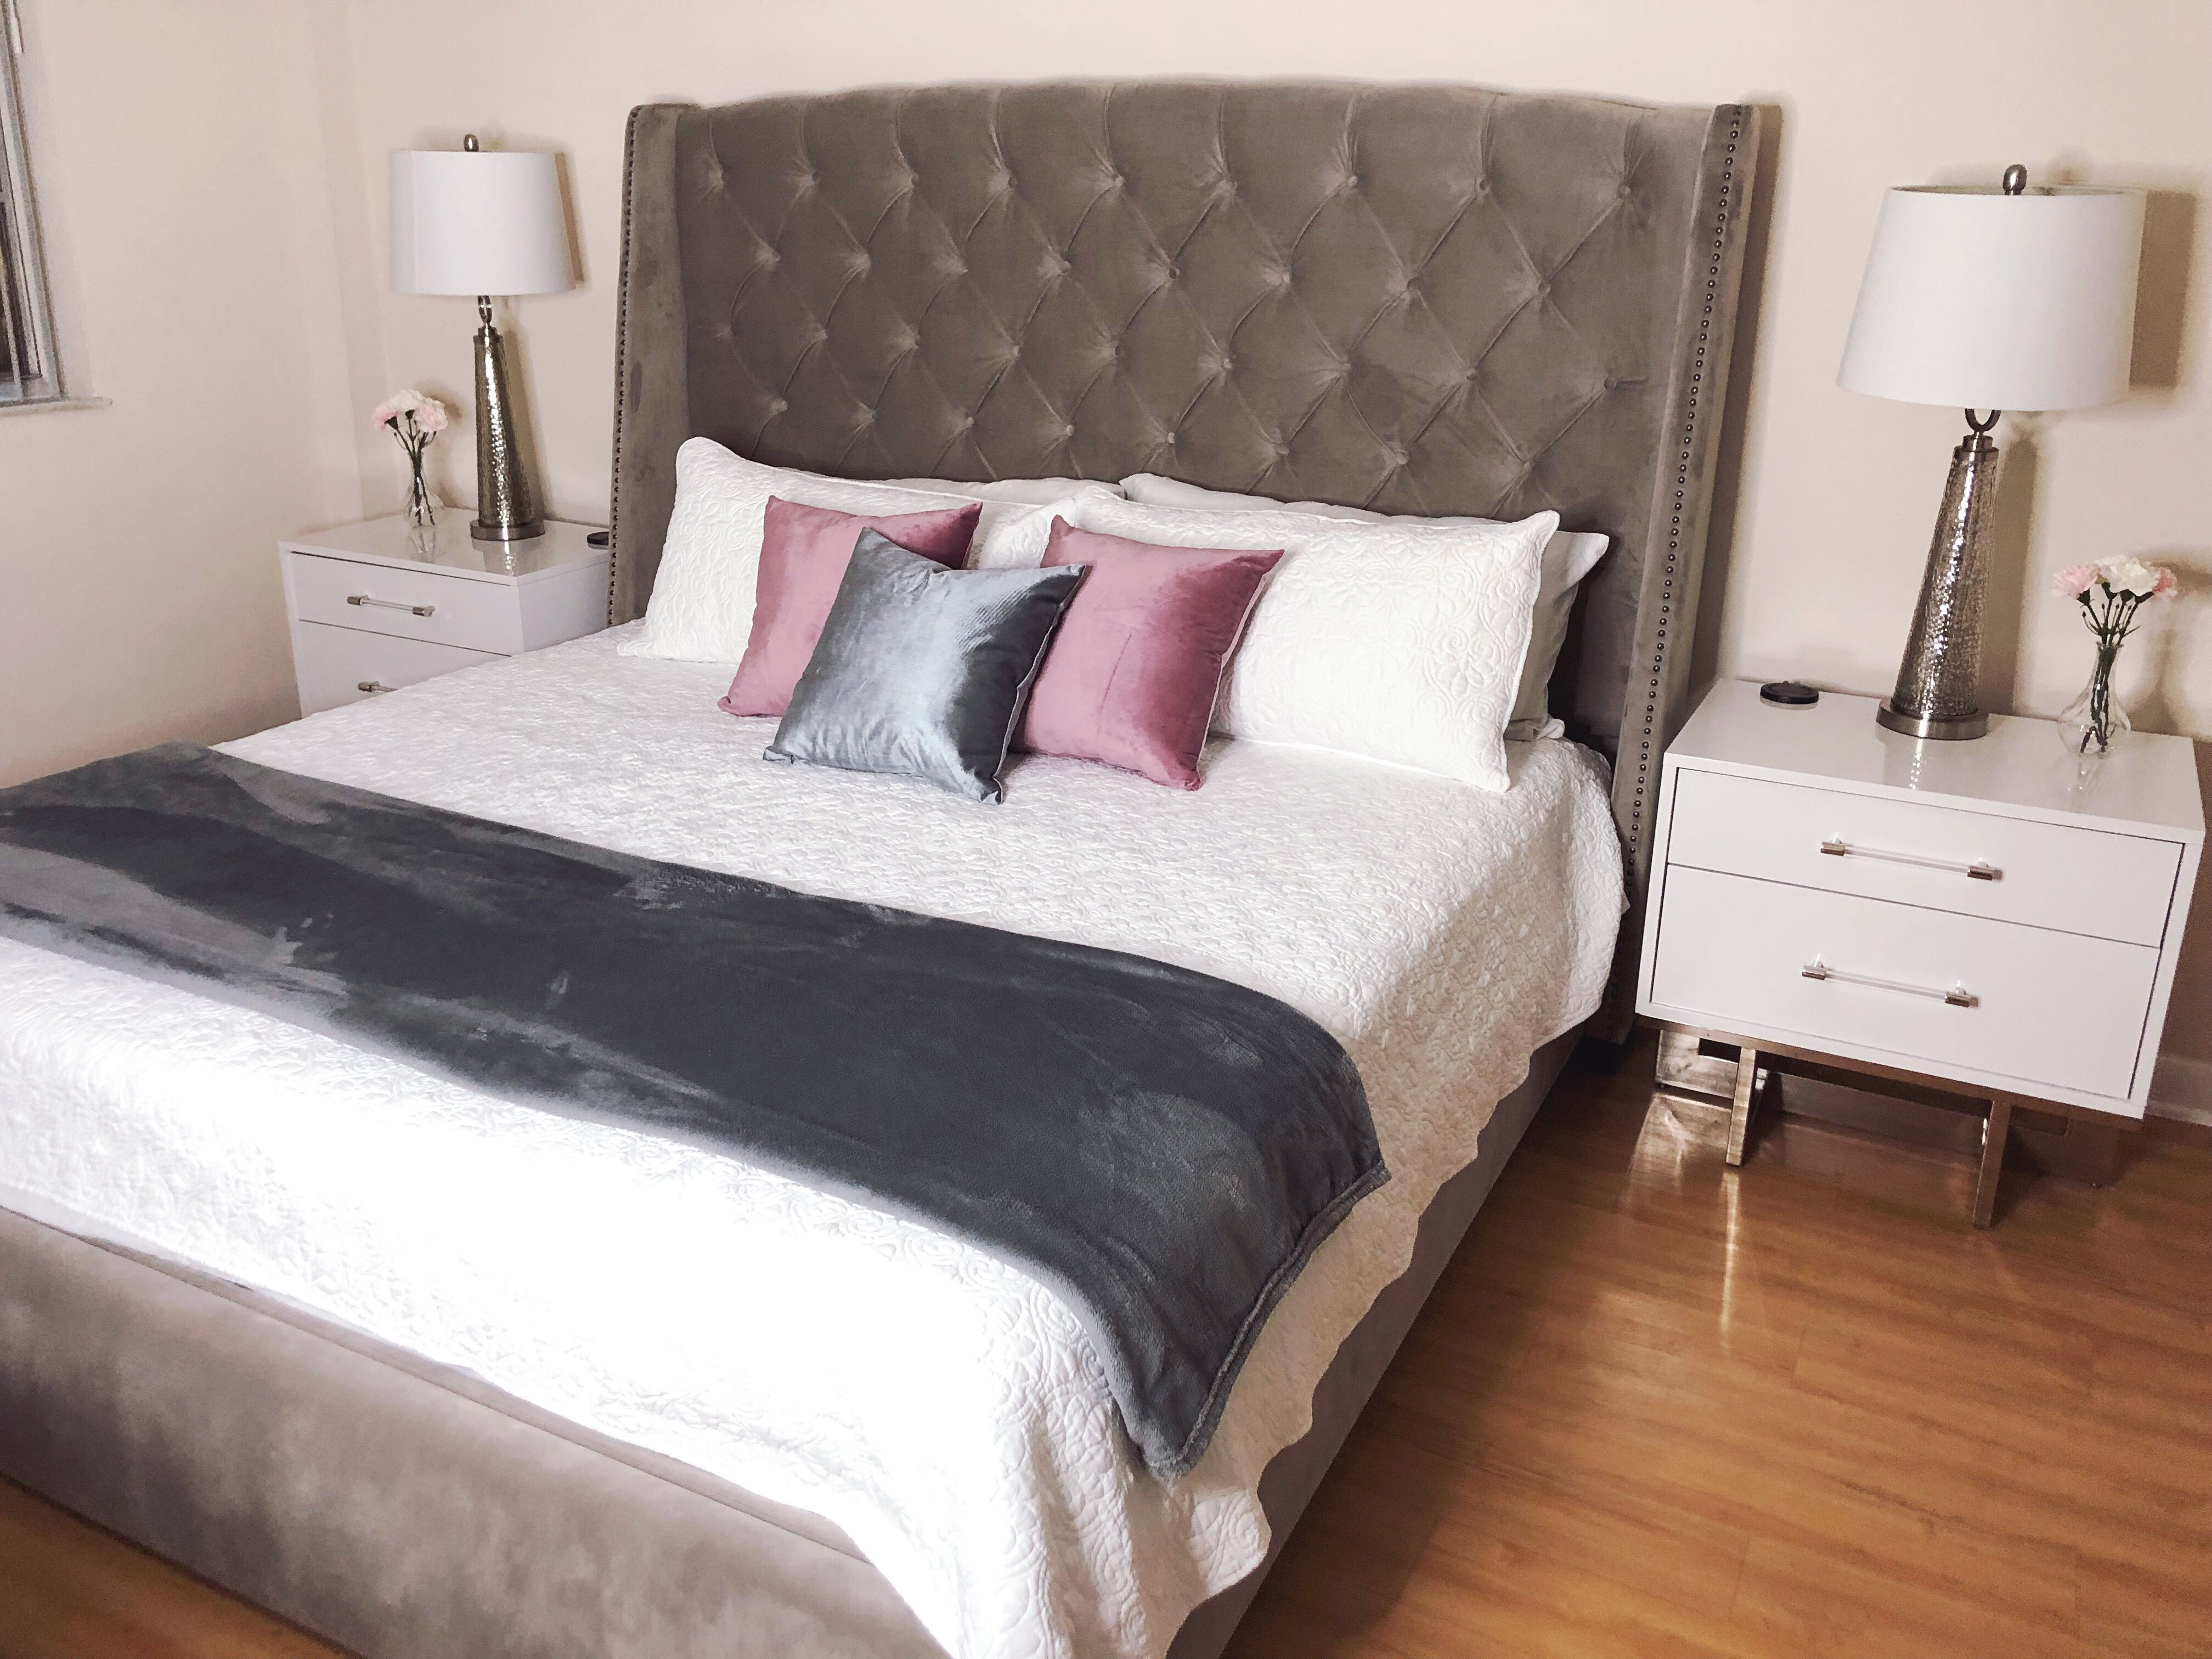 Modern Glam bedroom | Glam bedroom, Decor, Home decor